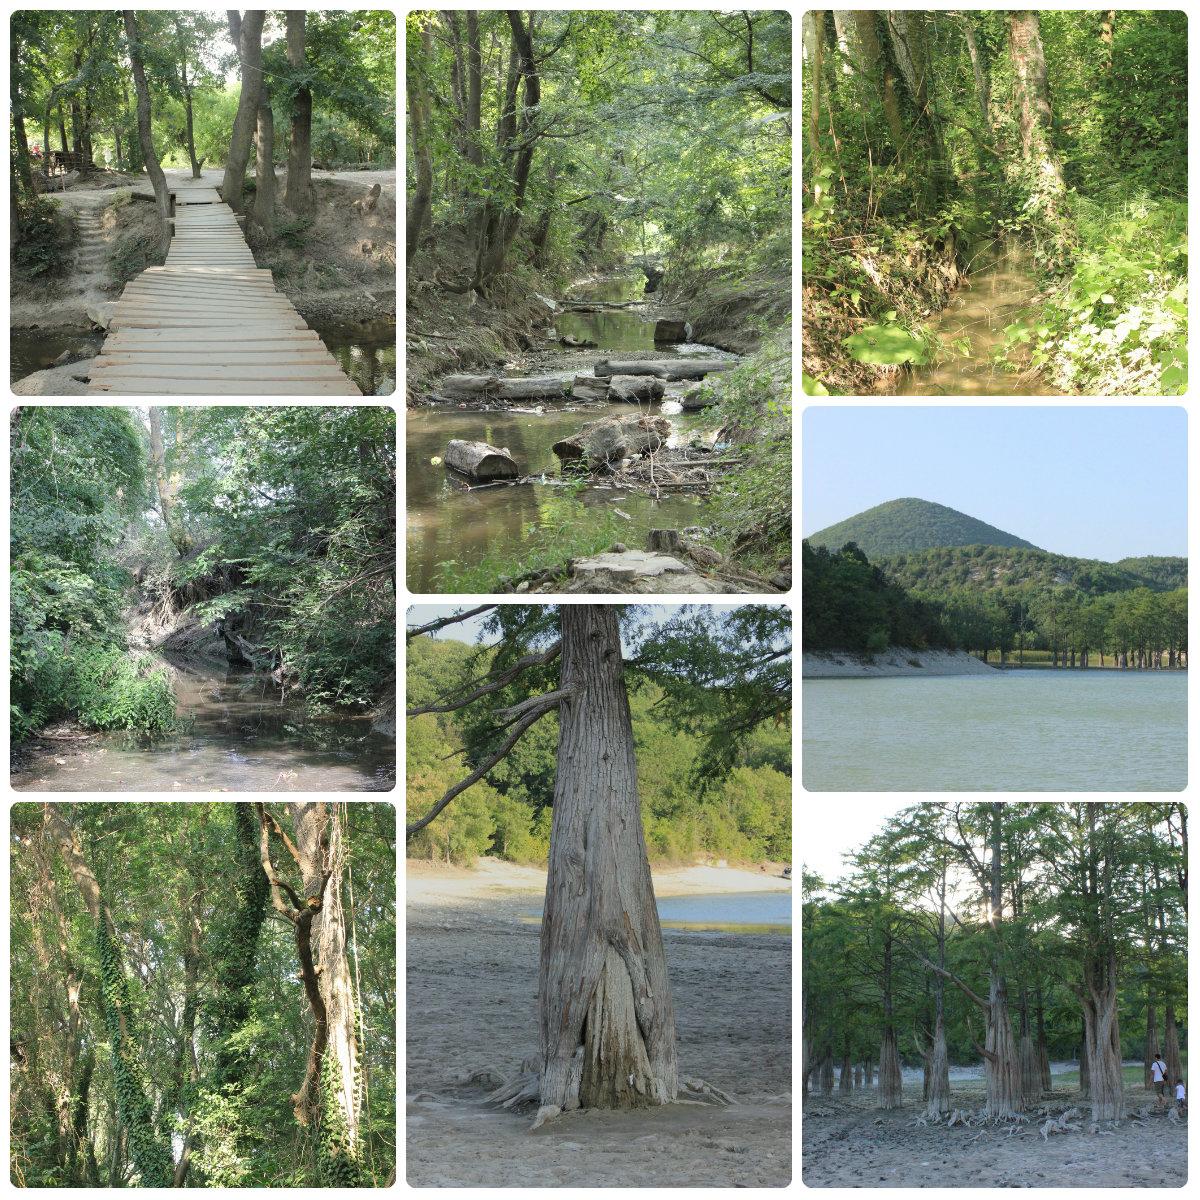 озеро-речка-collage